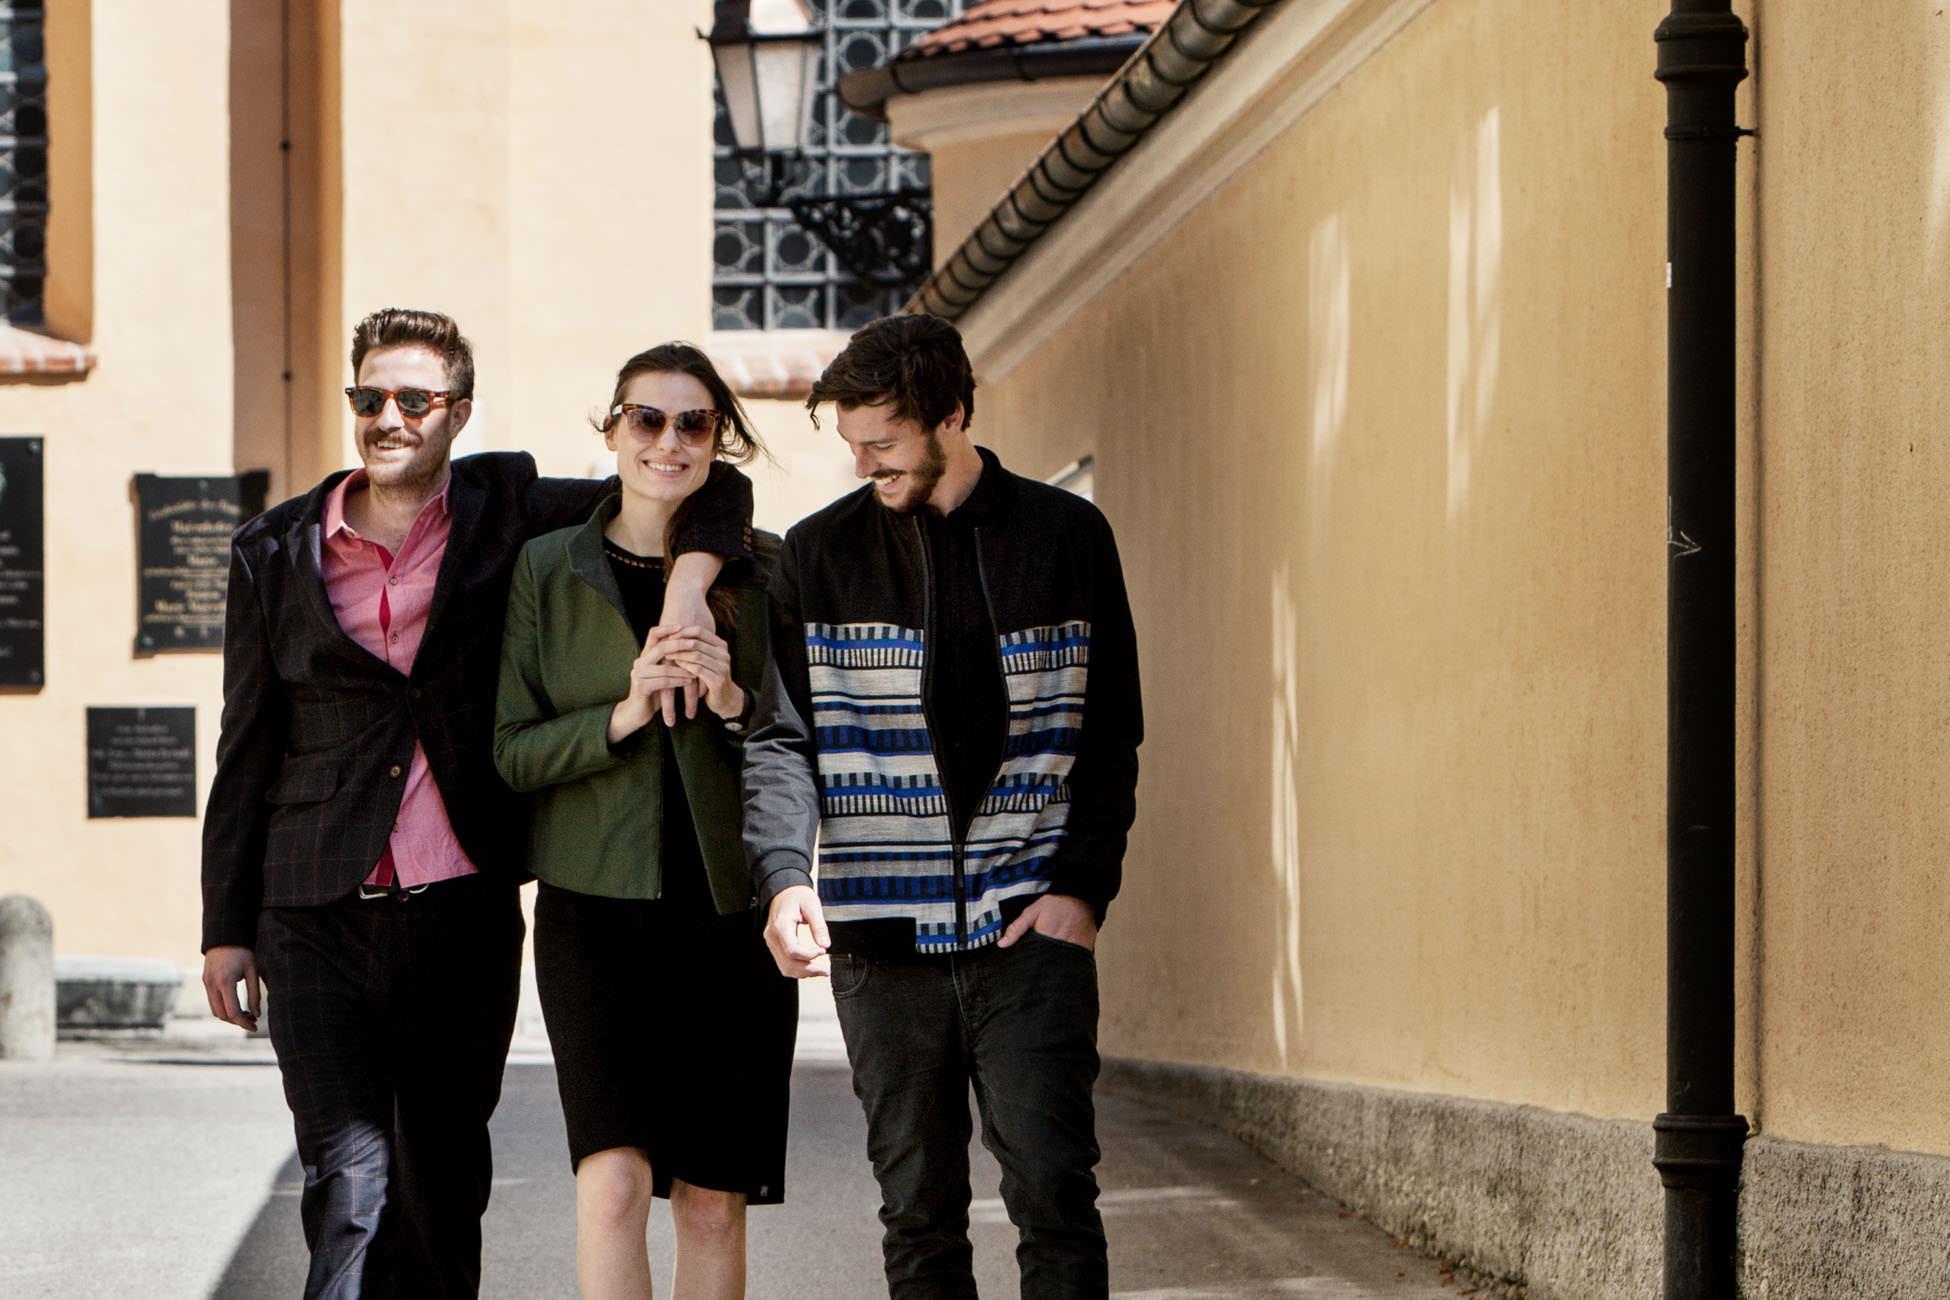 akjumii glücklich Mann Frau lachend gelb modekollektion mode münchen jörn strojny